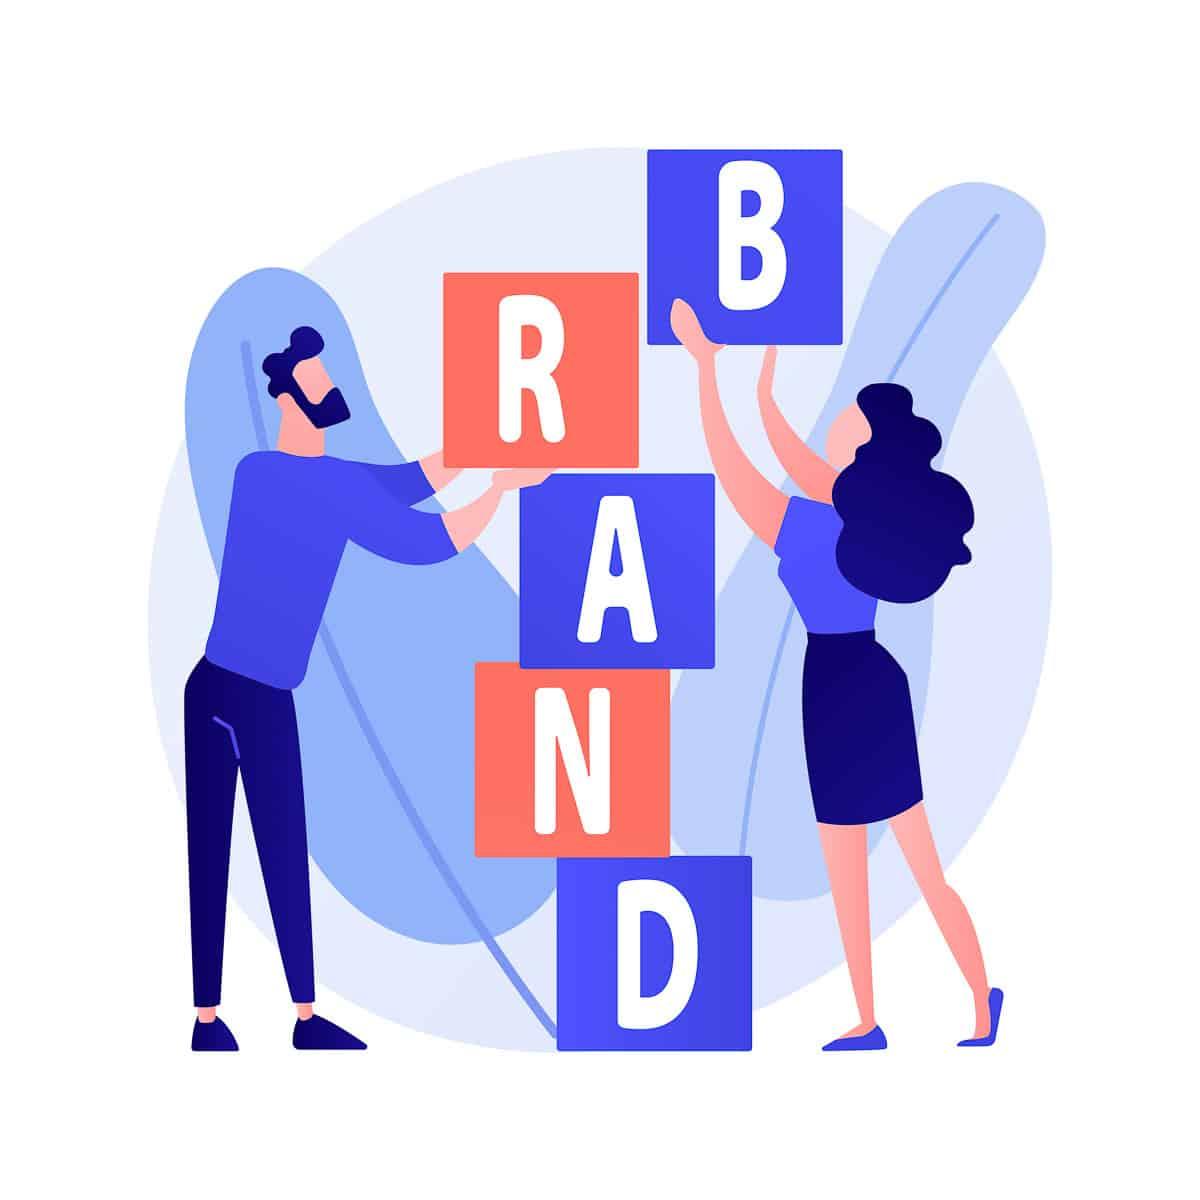 Product brand building vector concept metaphor.